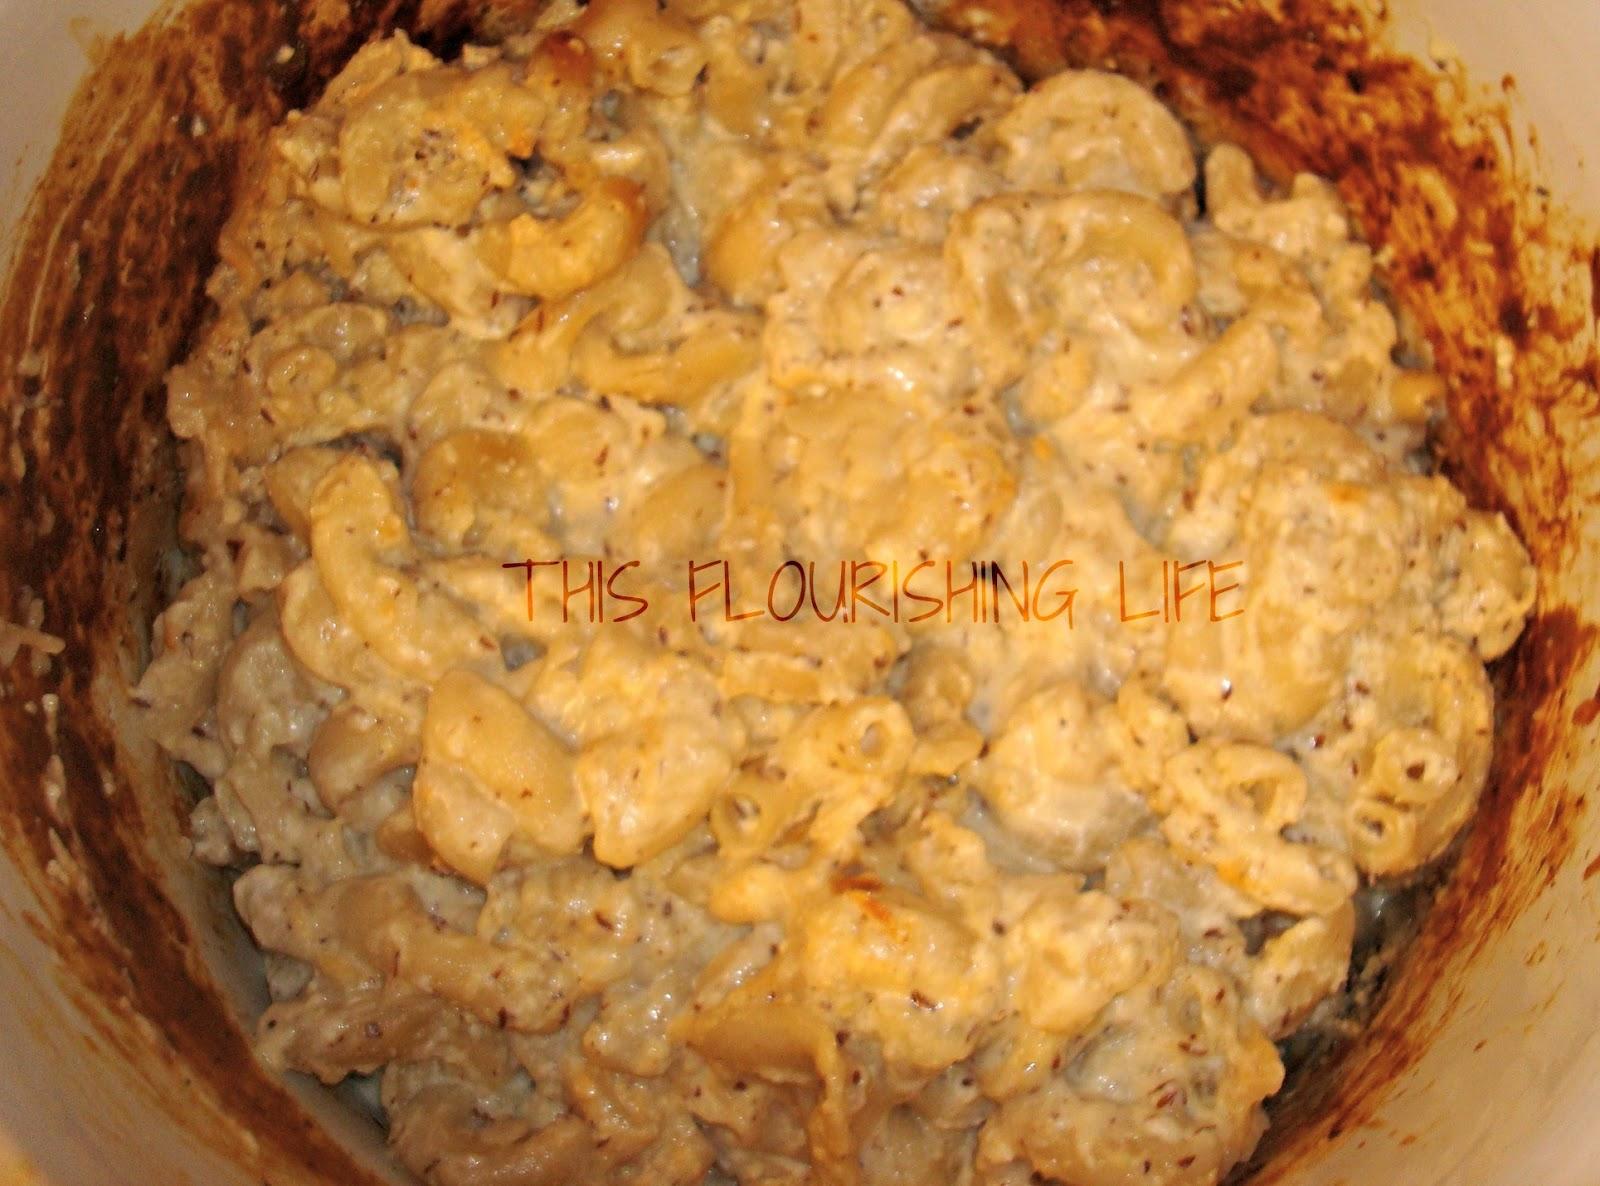 Recipe: Gluten-Free Crock-Pot Mac And Cheese - This Flourishing Life